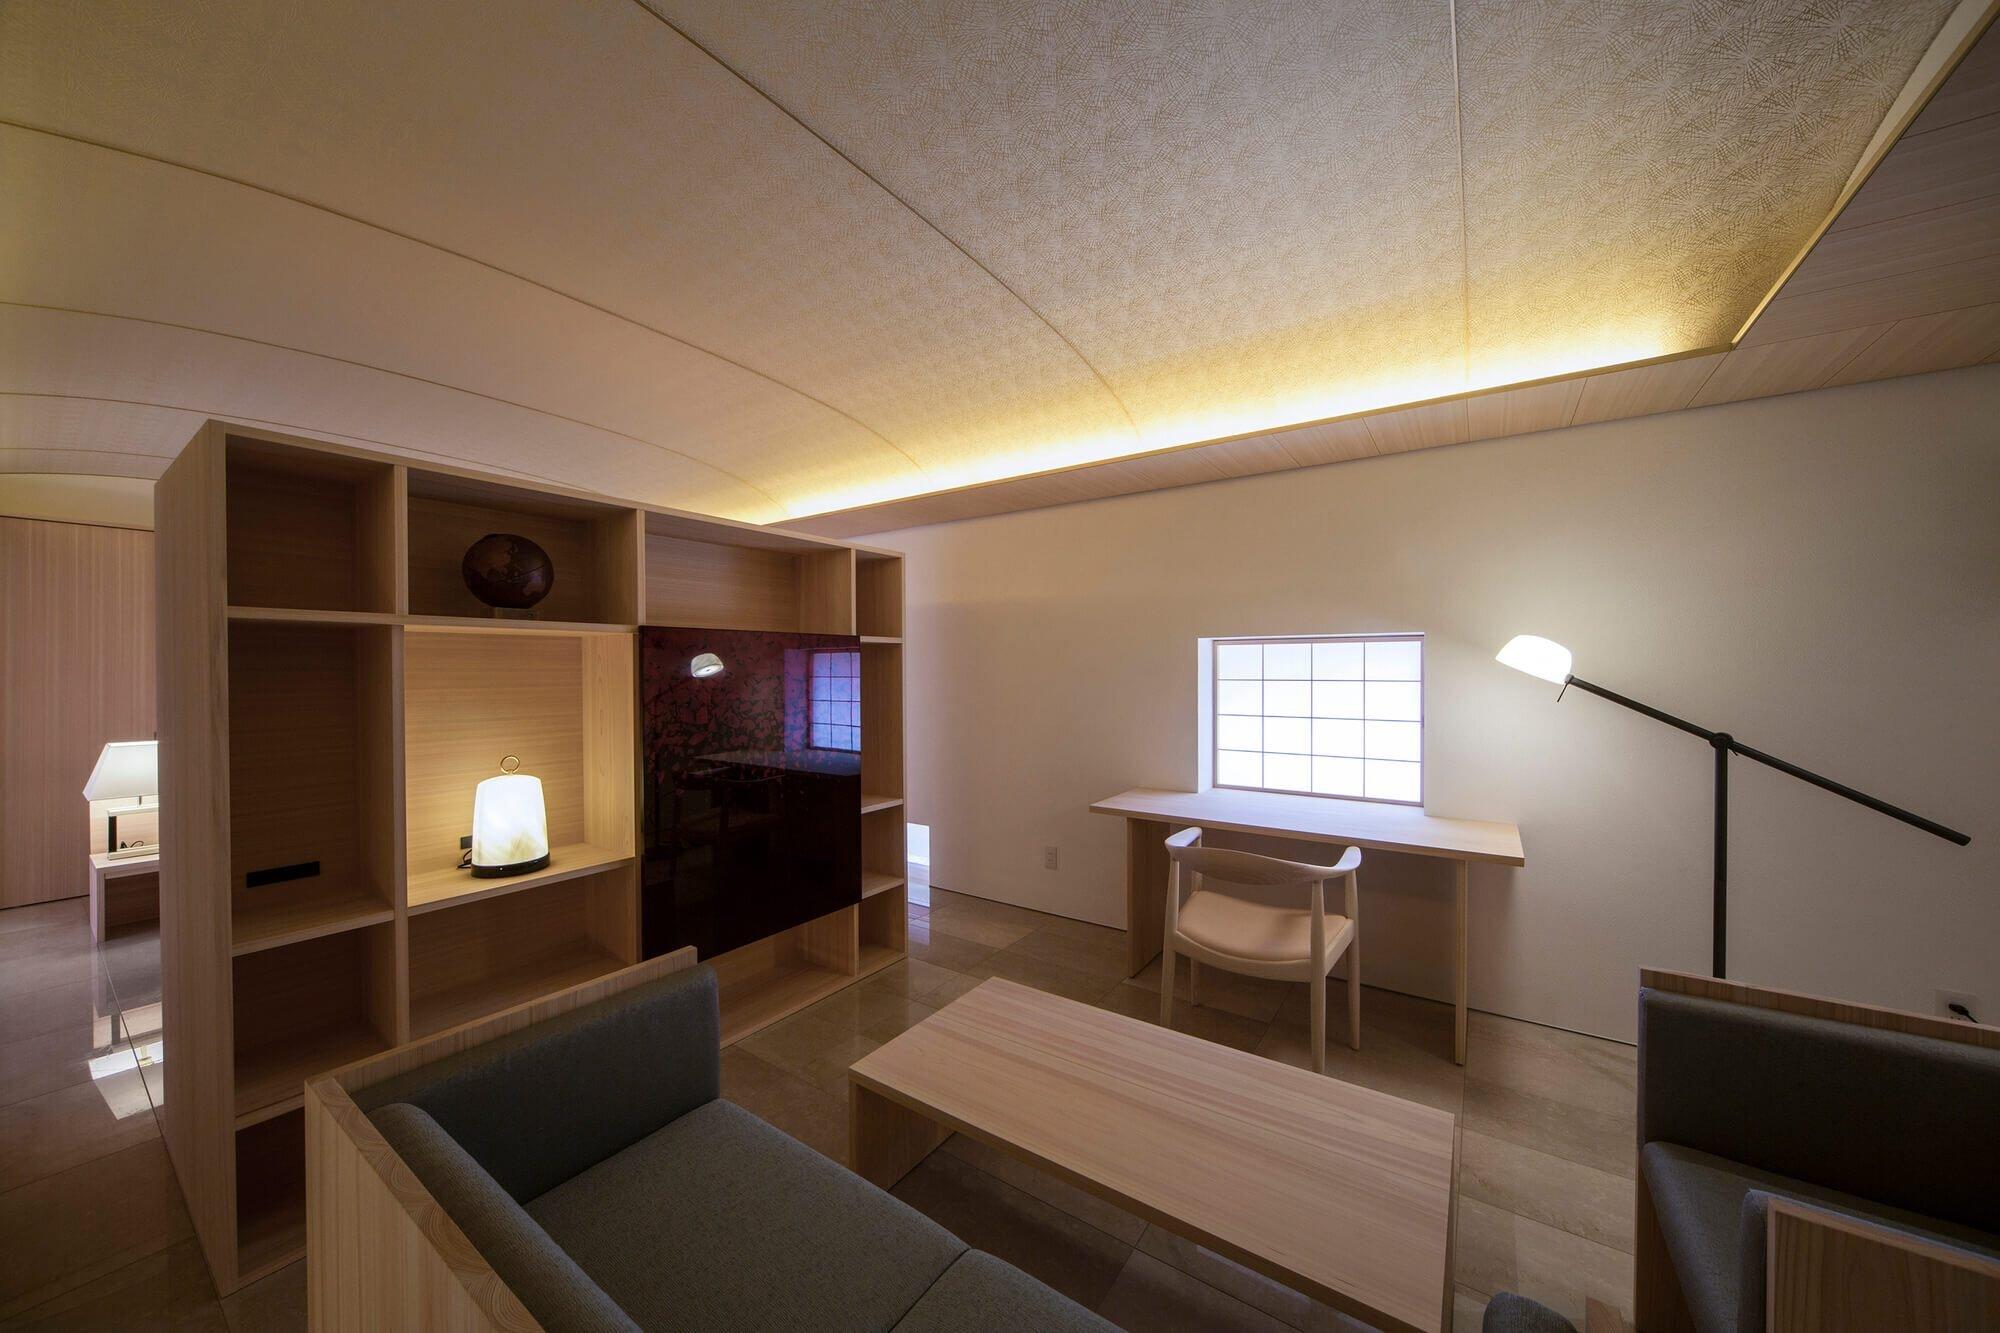 Oukikyo-Atsumasa-Tamura-Design-Office-Japan-20